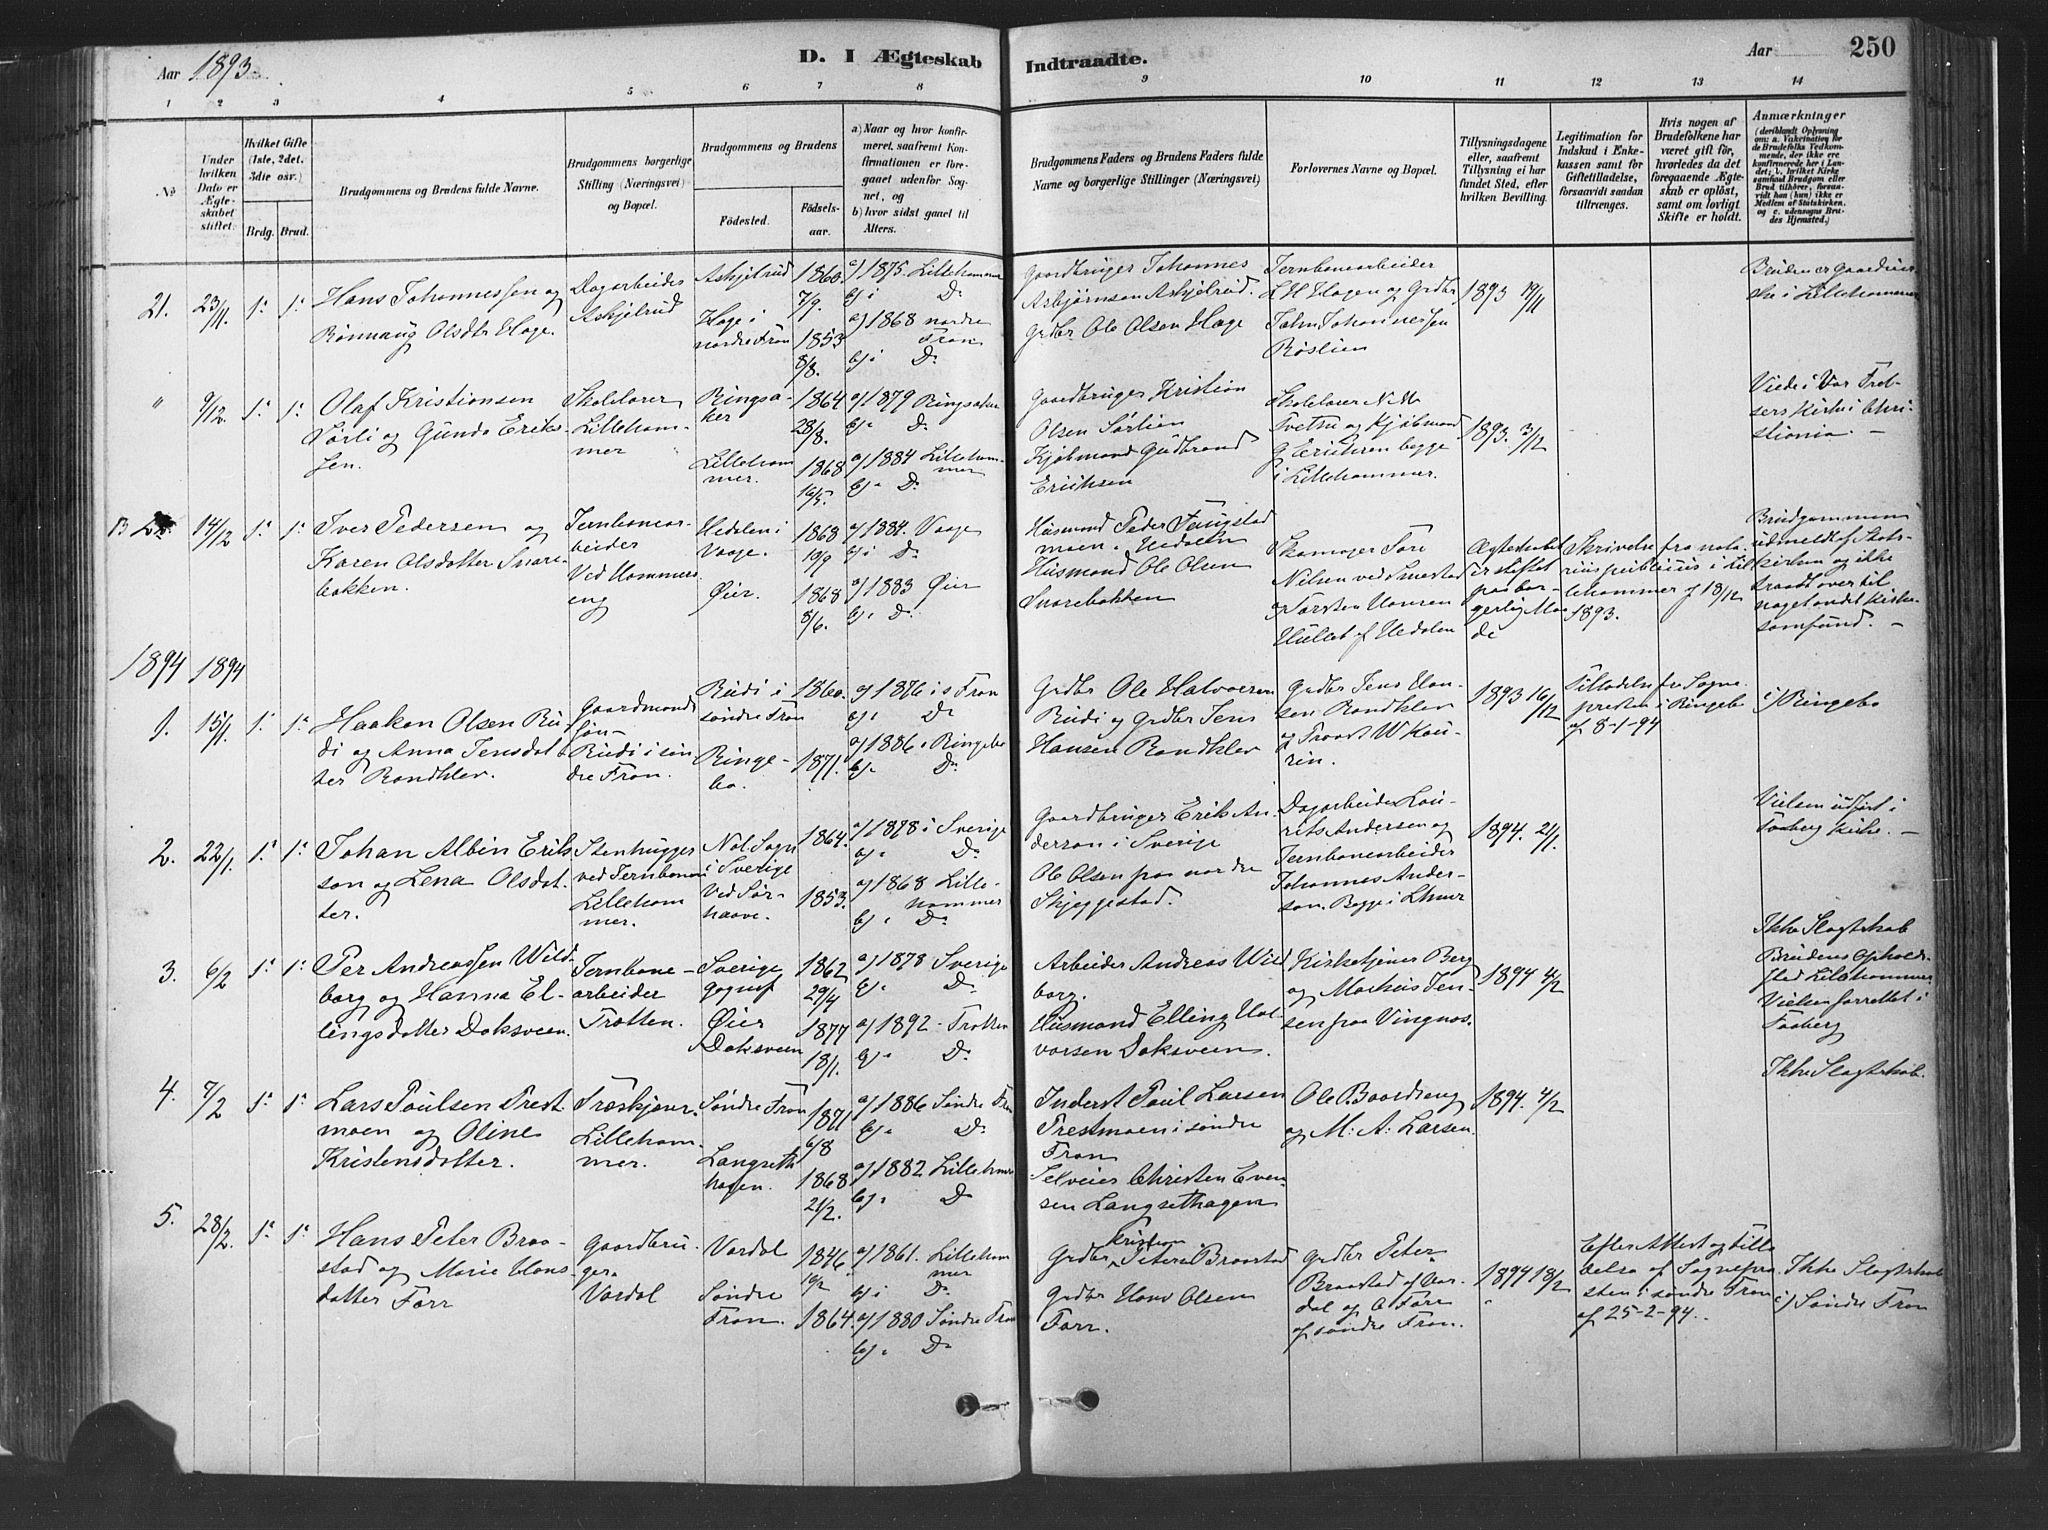 SAH, Fåberg prestekontor, H/Ha/Haa/L0010: Parish register (official) no. 10, 1879-1900, p. 250